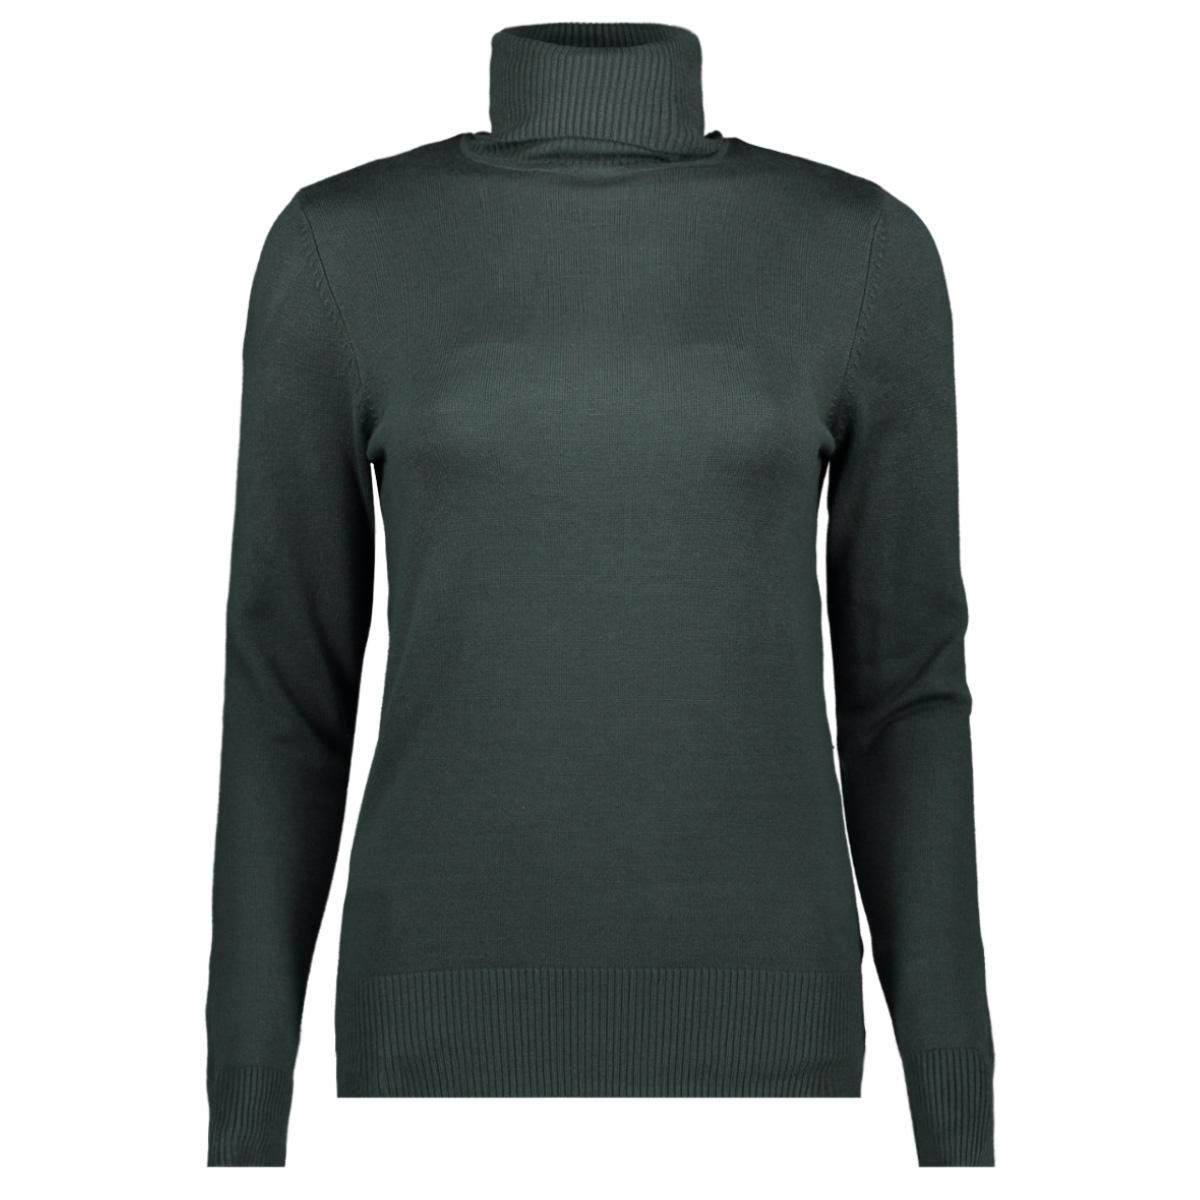 roll neck sweater j2046 30500018 saint tropez trui 8298